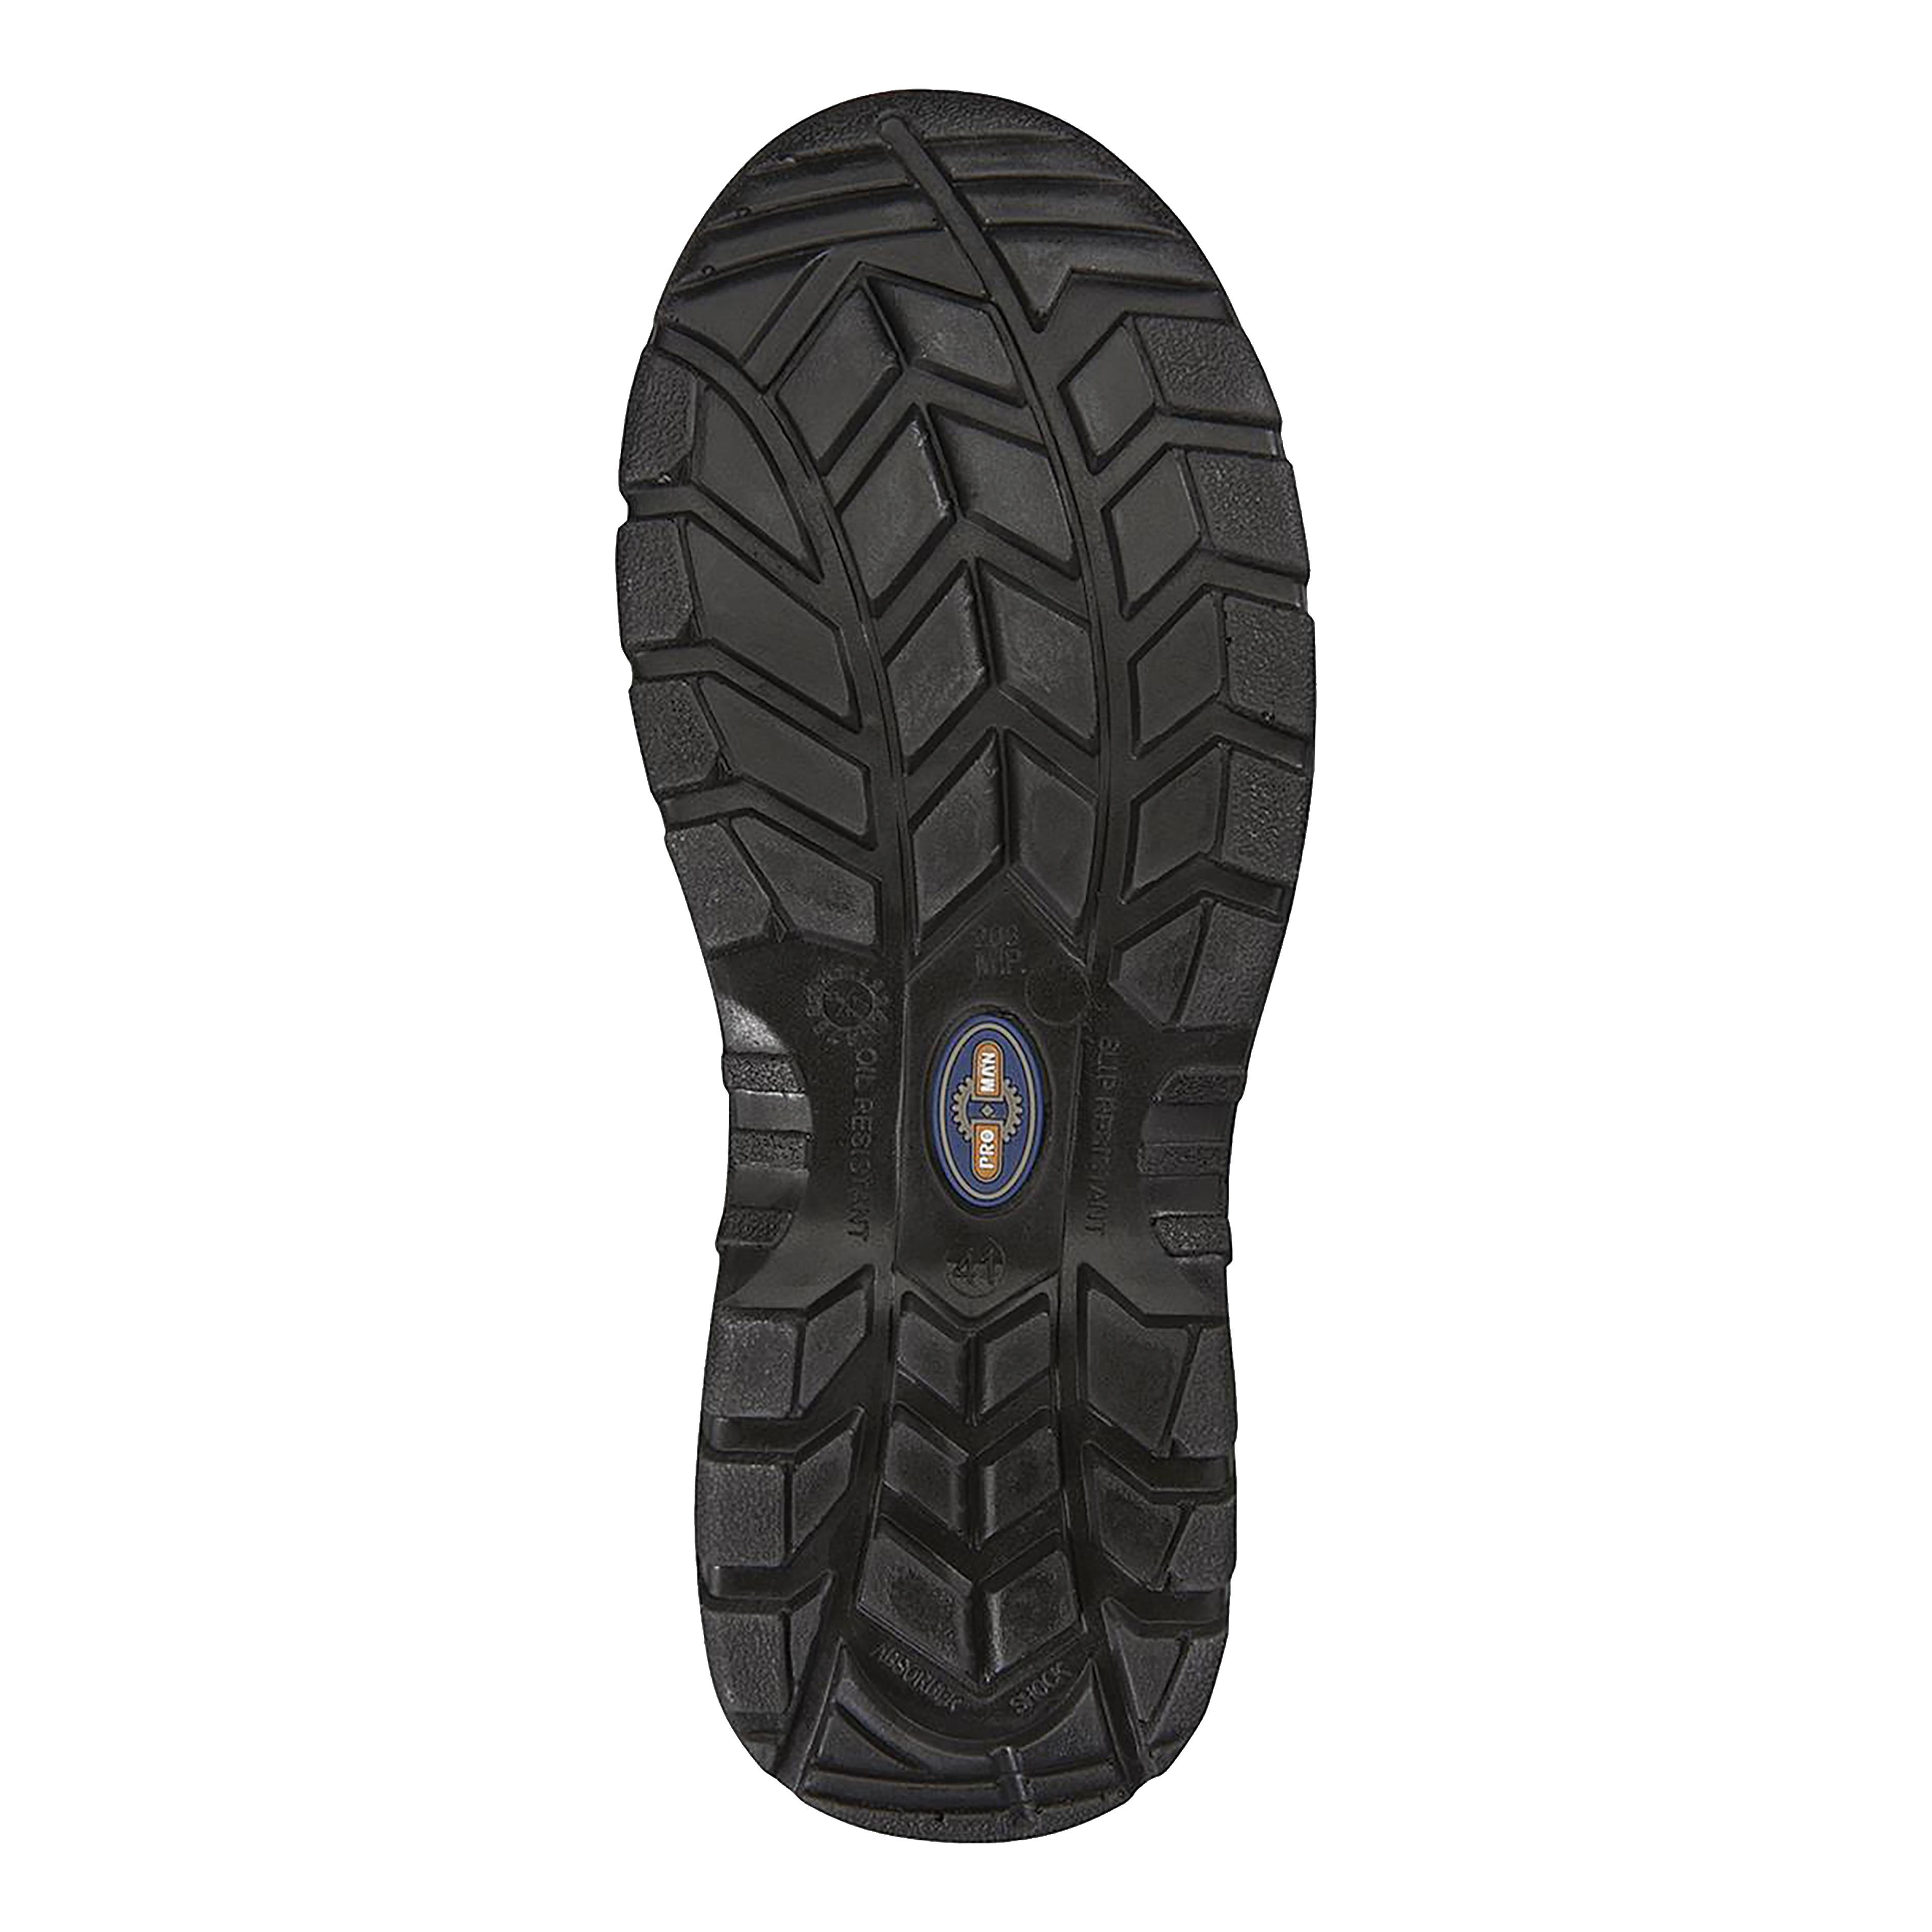 Rockfall ProMan Chukka Shoe Leather Steel Toecap Black Size 7 Ref PM102 7